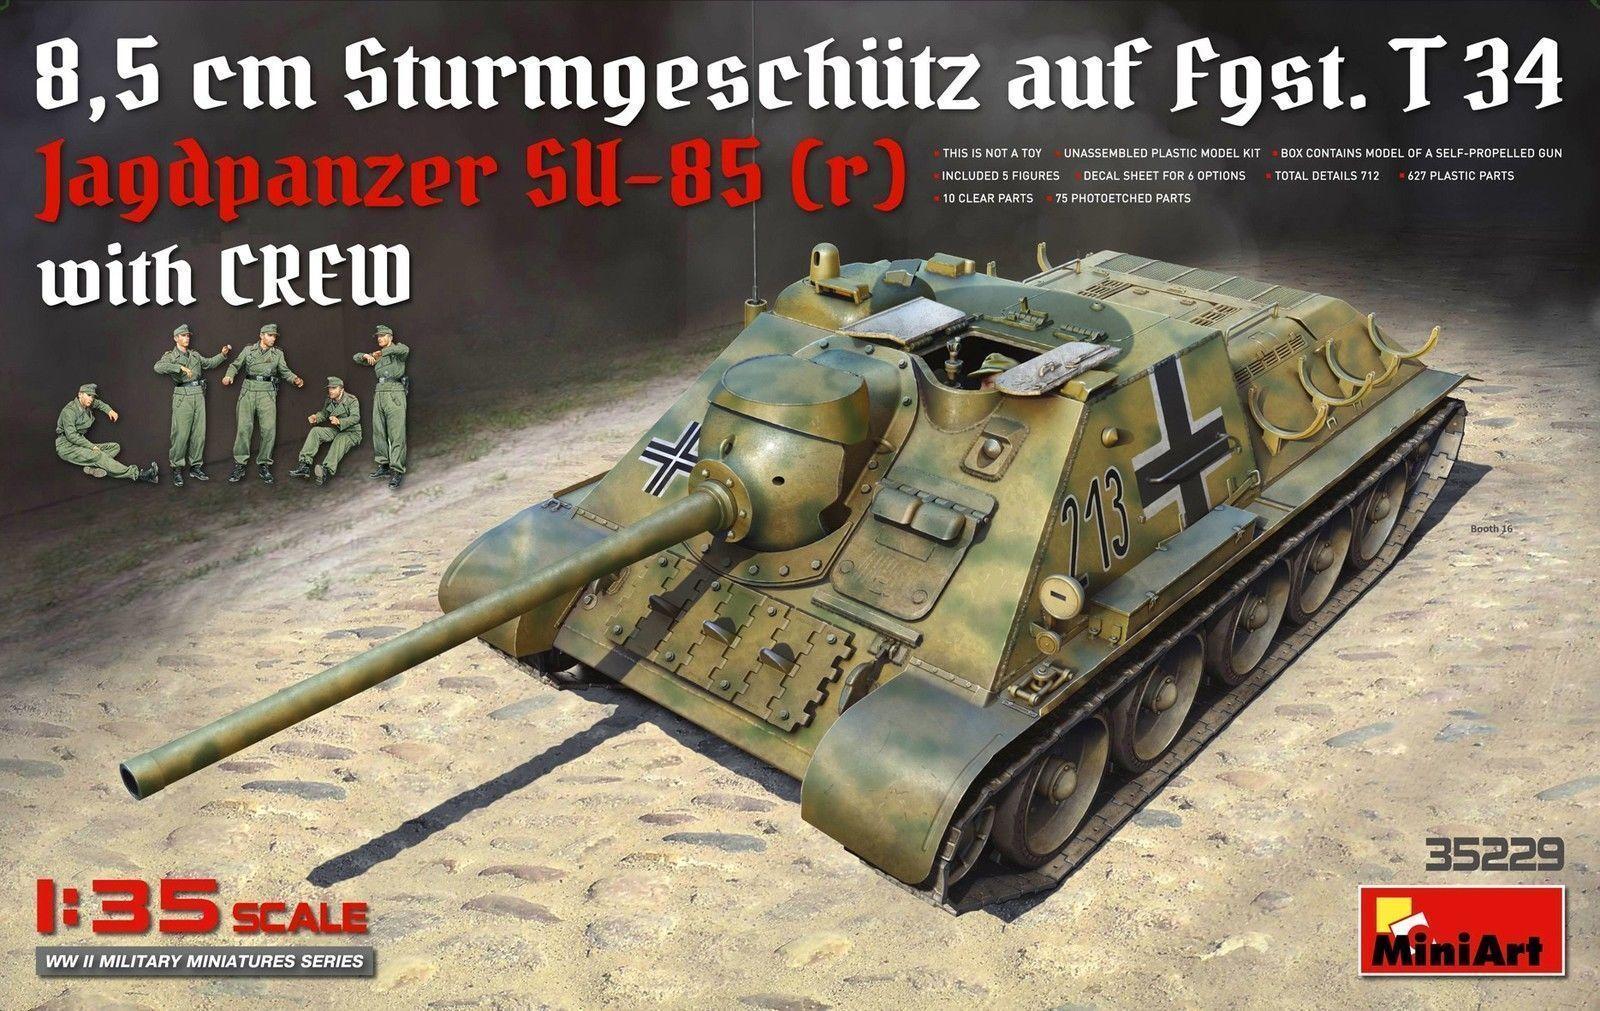 Miniart 35229 1 35th Jagdpanzer SU-85(r) + crew 8.5cm Sturmgeschutz auf fgst.T34